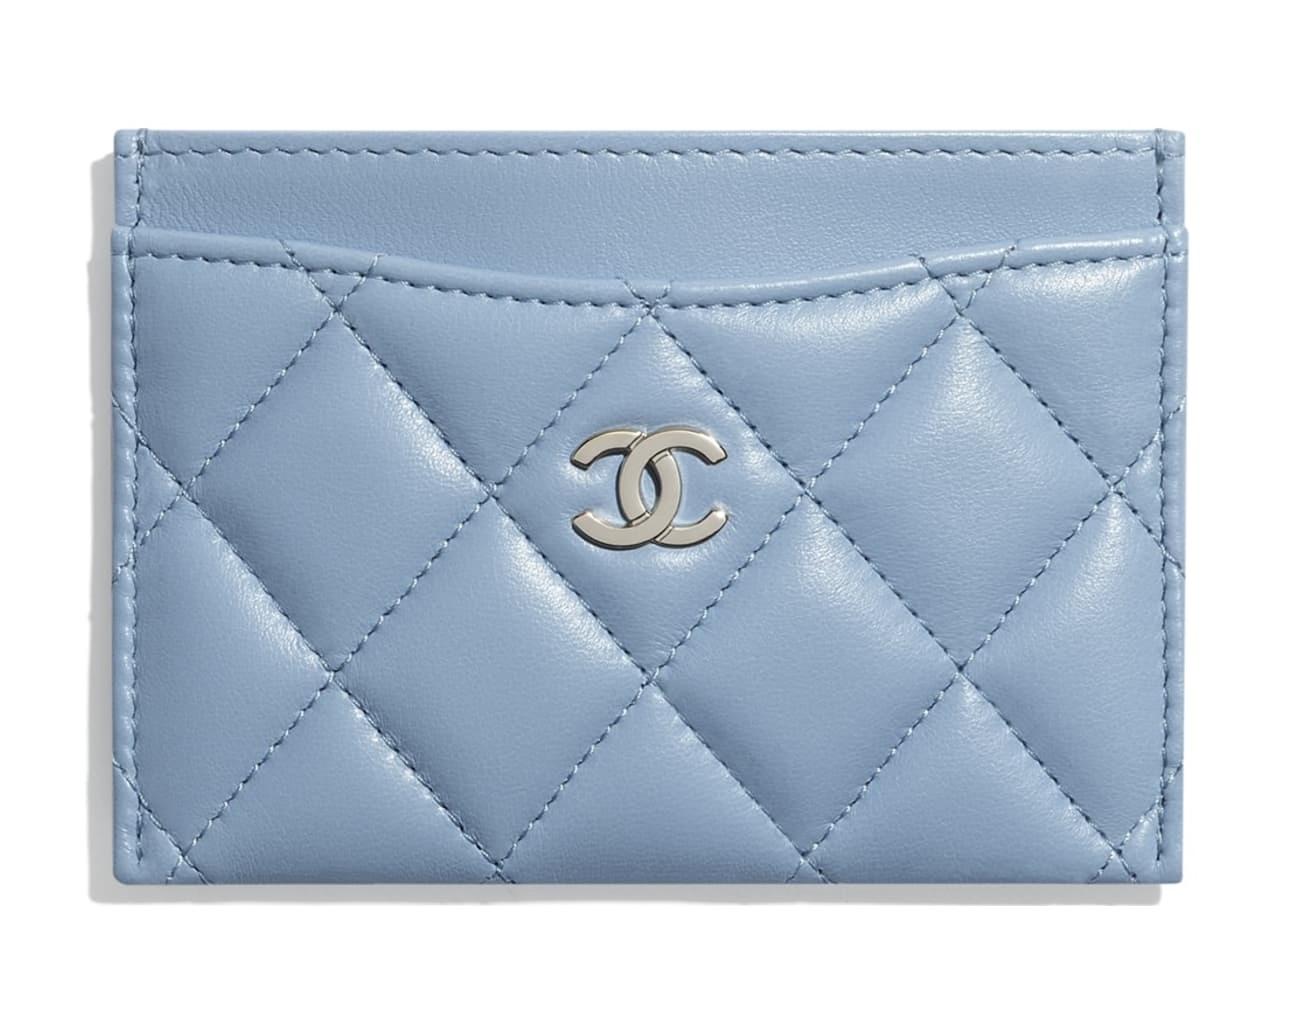 2020卡片夾推薦Top 10!Chanel、LV、Gucci...全部只要花小資女1萬上下! -0